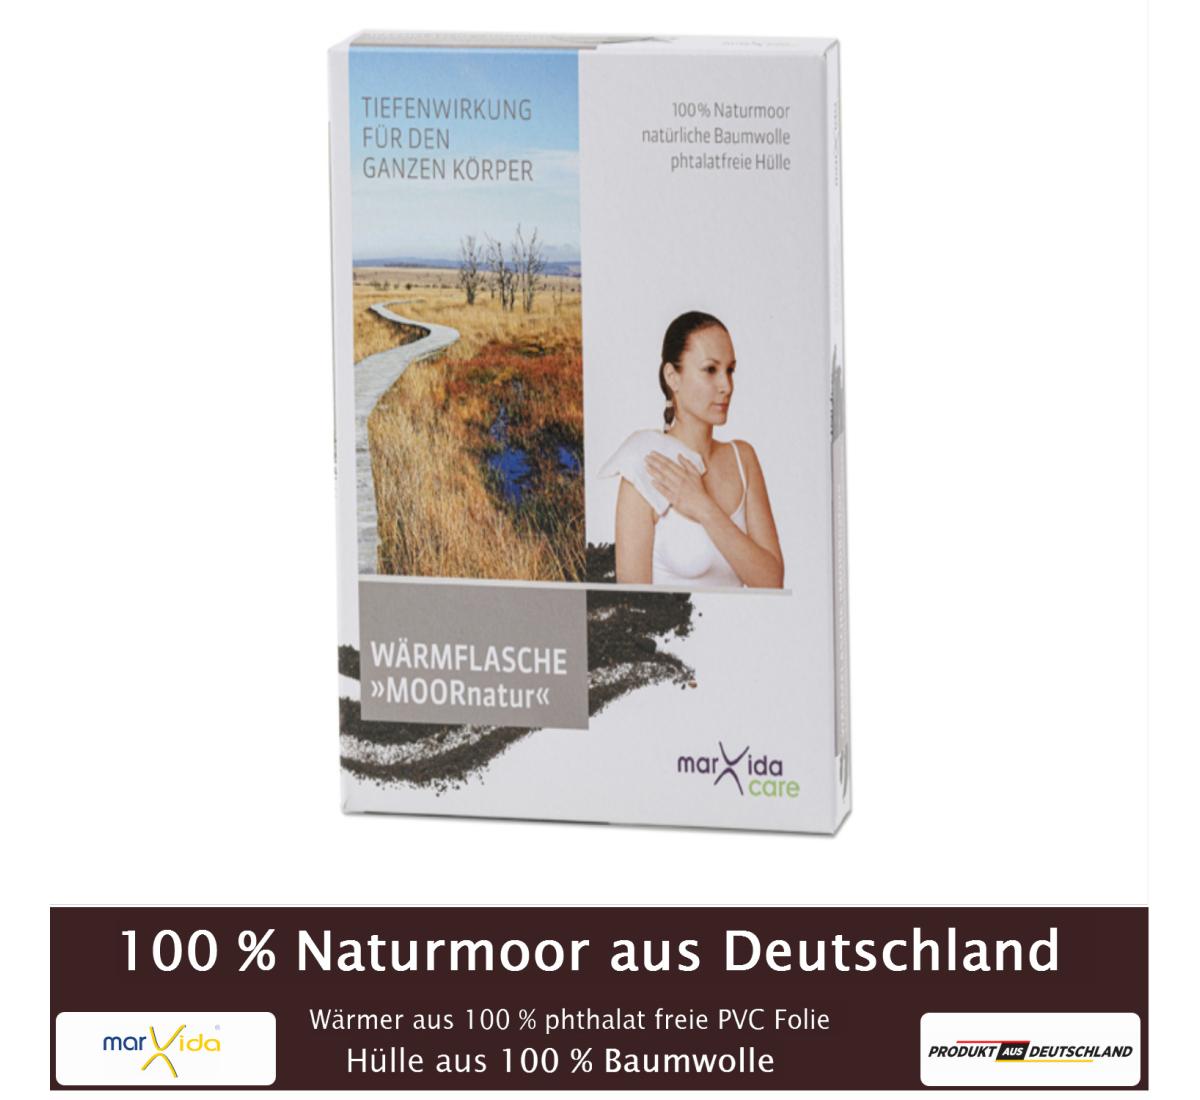 marvida care: Wärmflasche »MOORnatur«